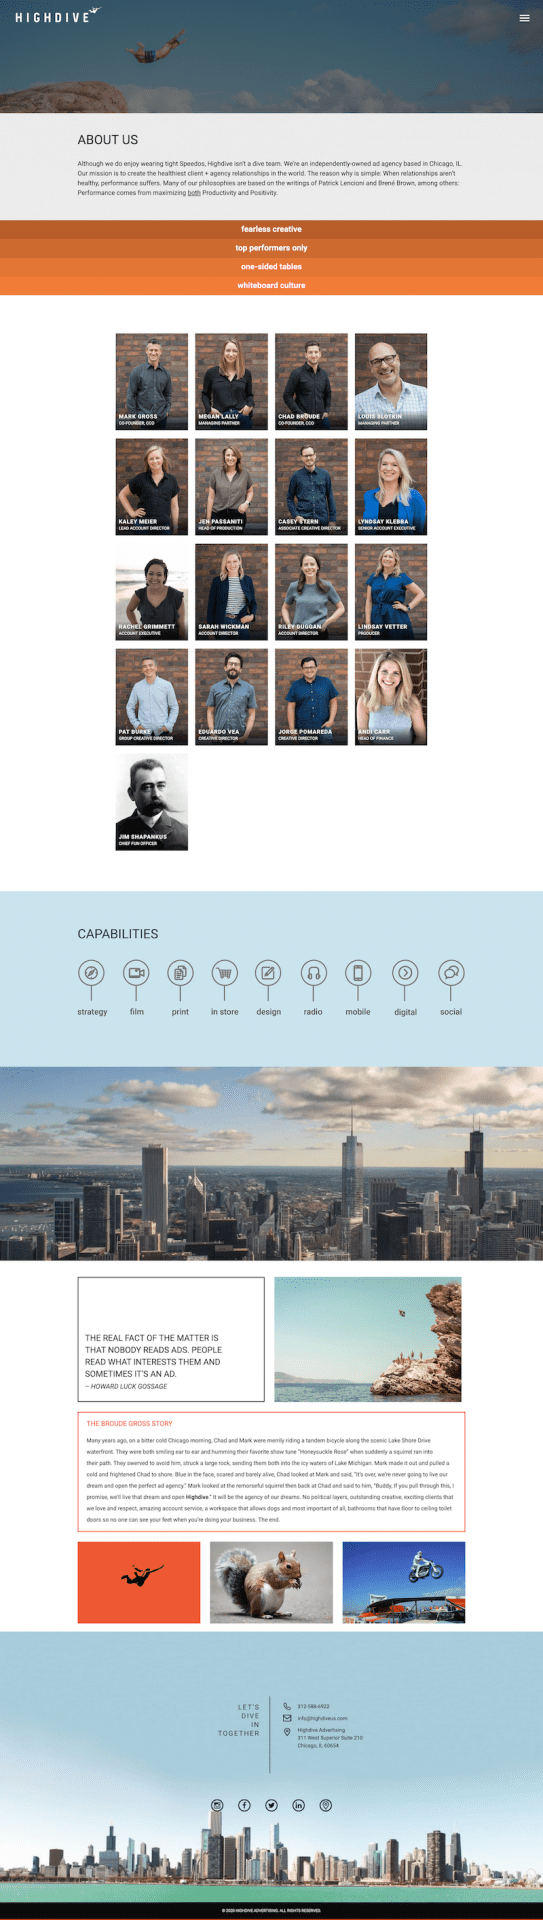 Highdive Advertising Website